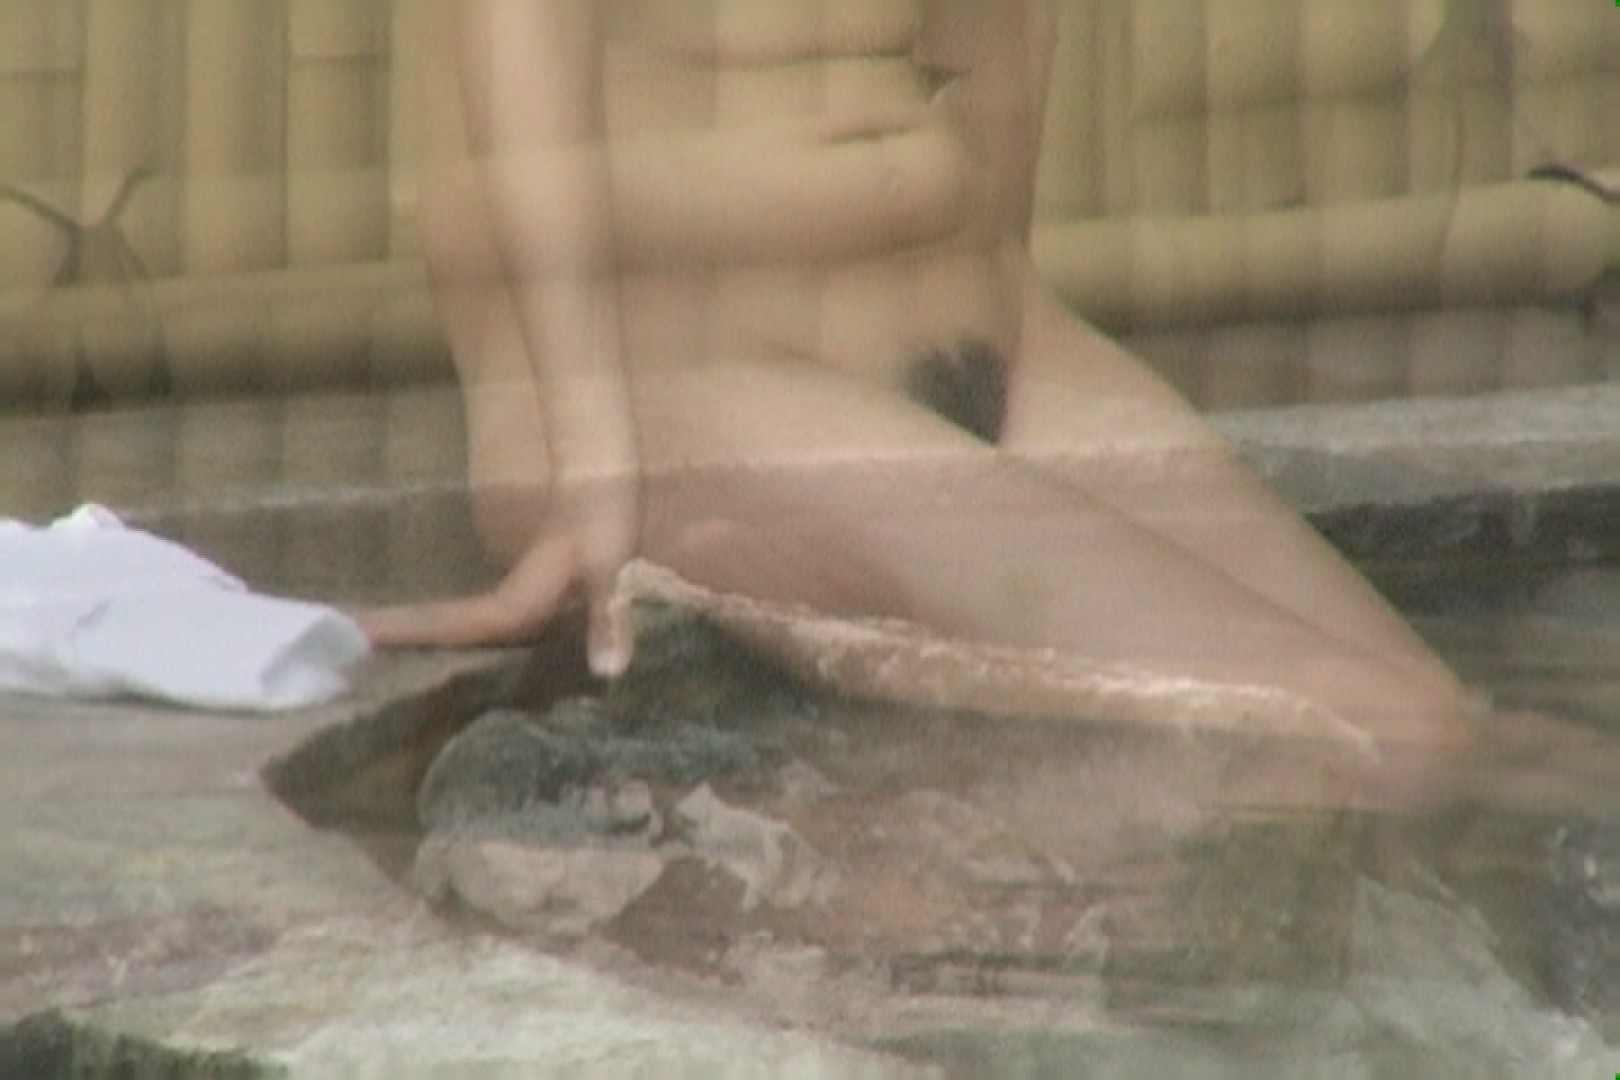 Aquaな露天風呂Vol.629 0  23連発 10